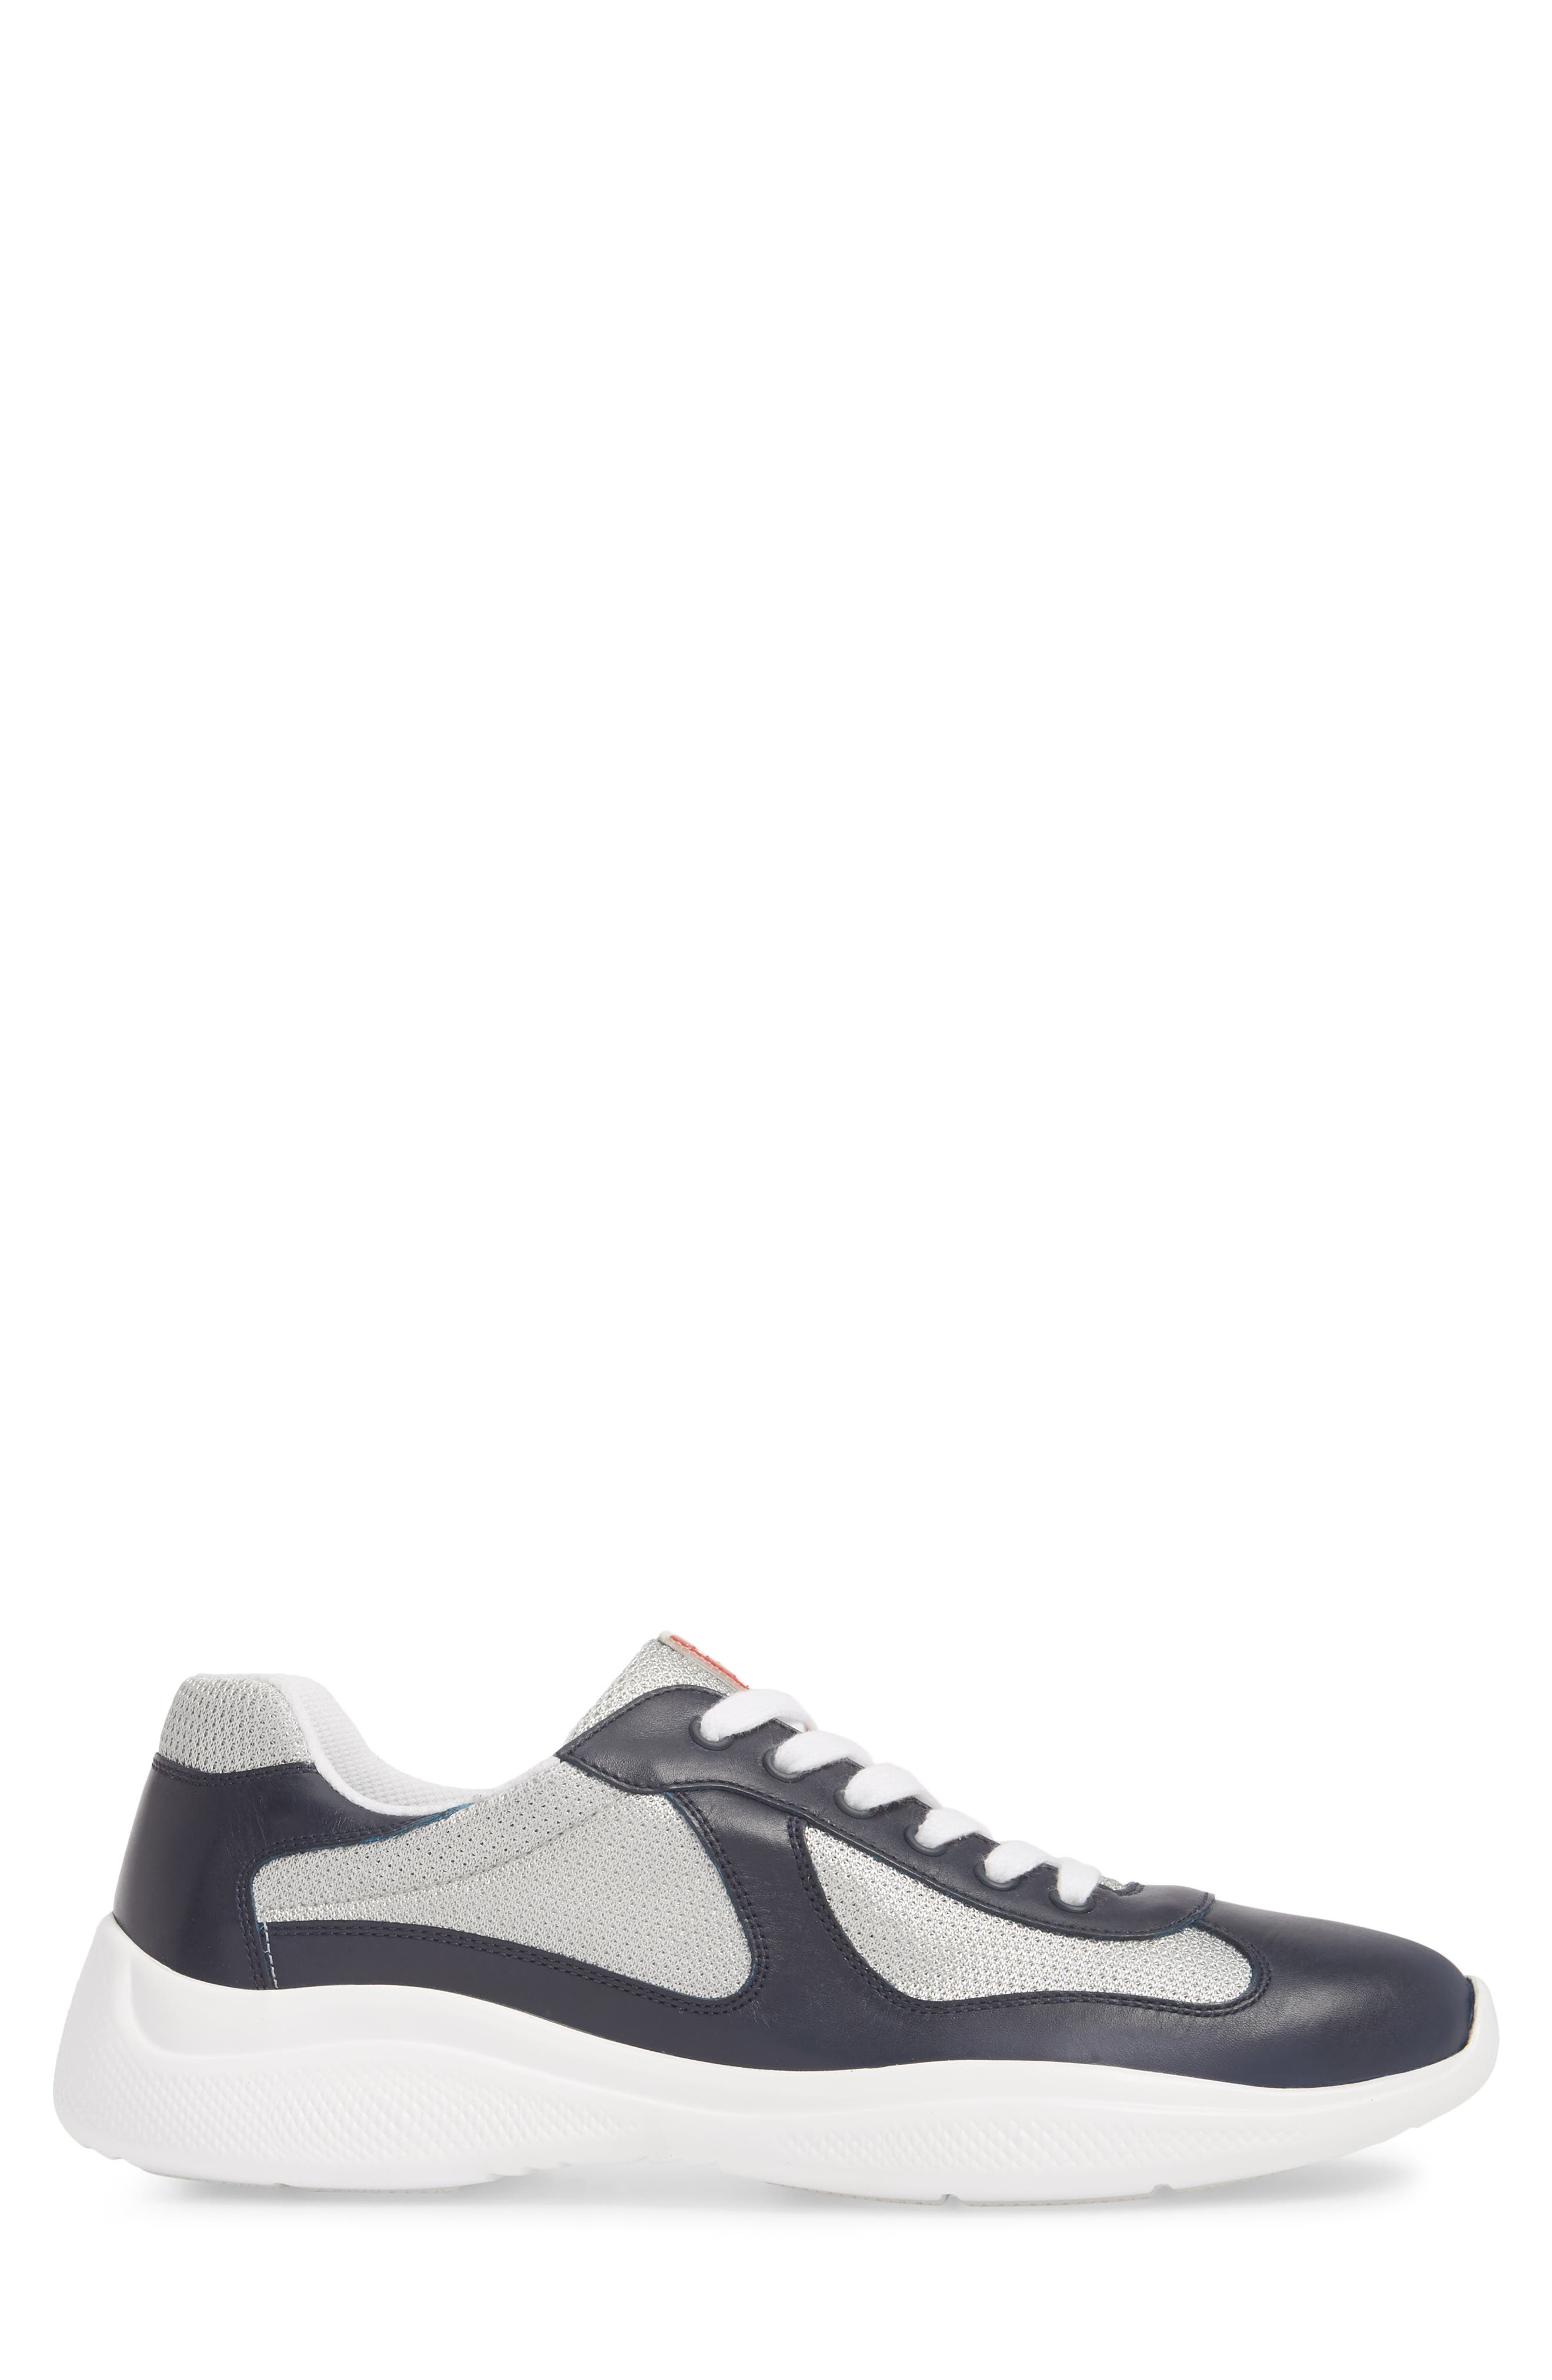 'Punta Ala' Sneaker,                             Alternate thumbnail 3, color,                             Baltic Blue/ Argento